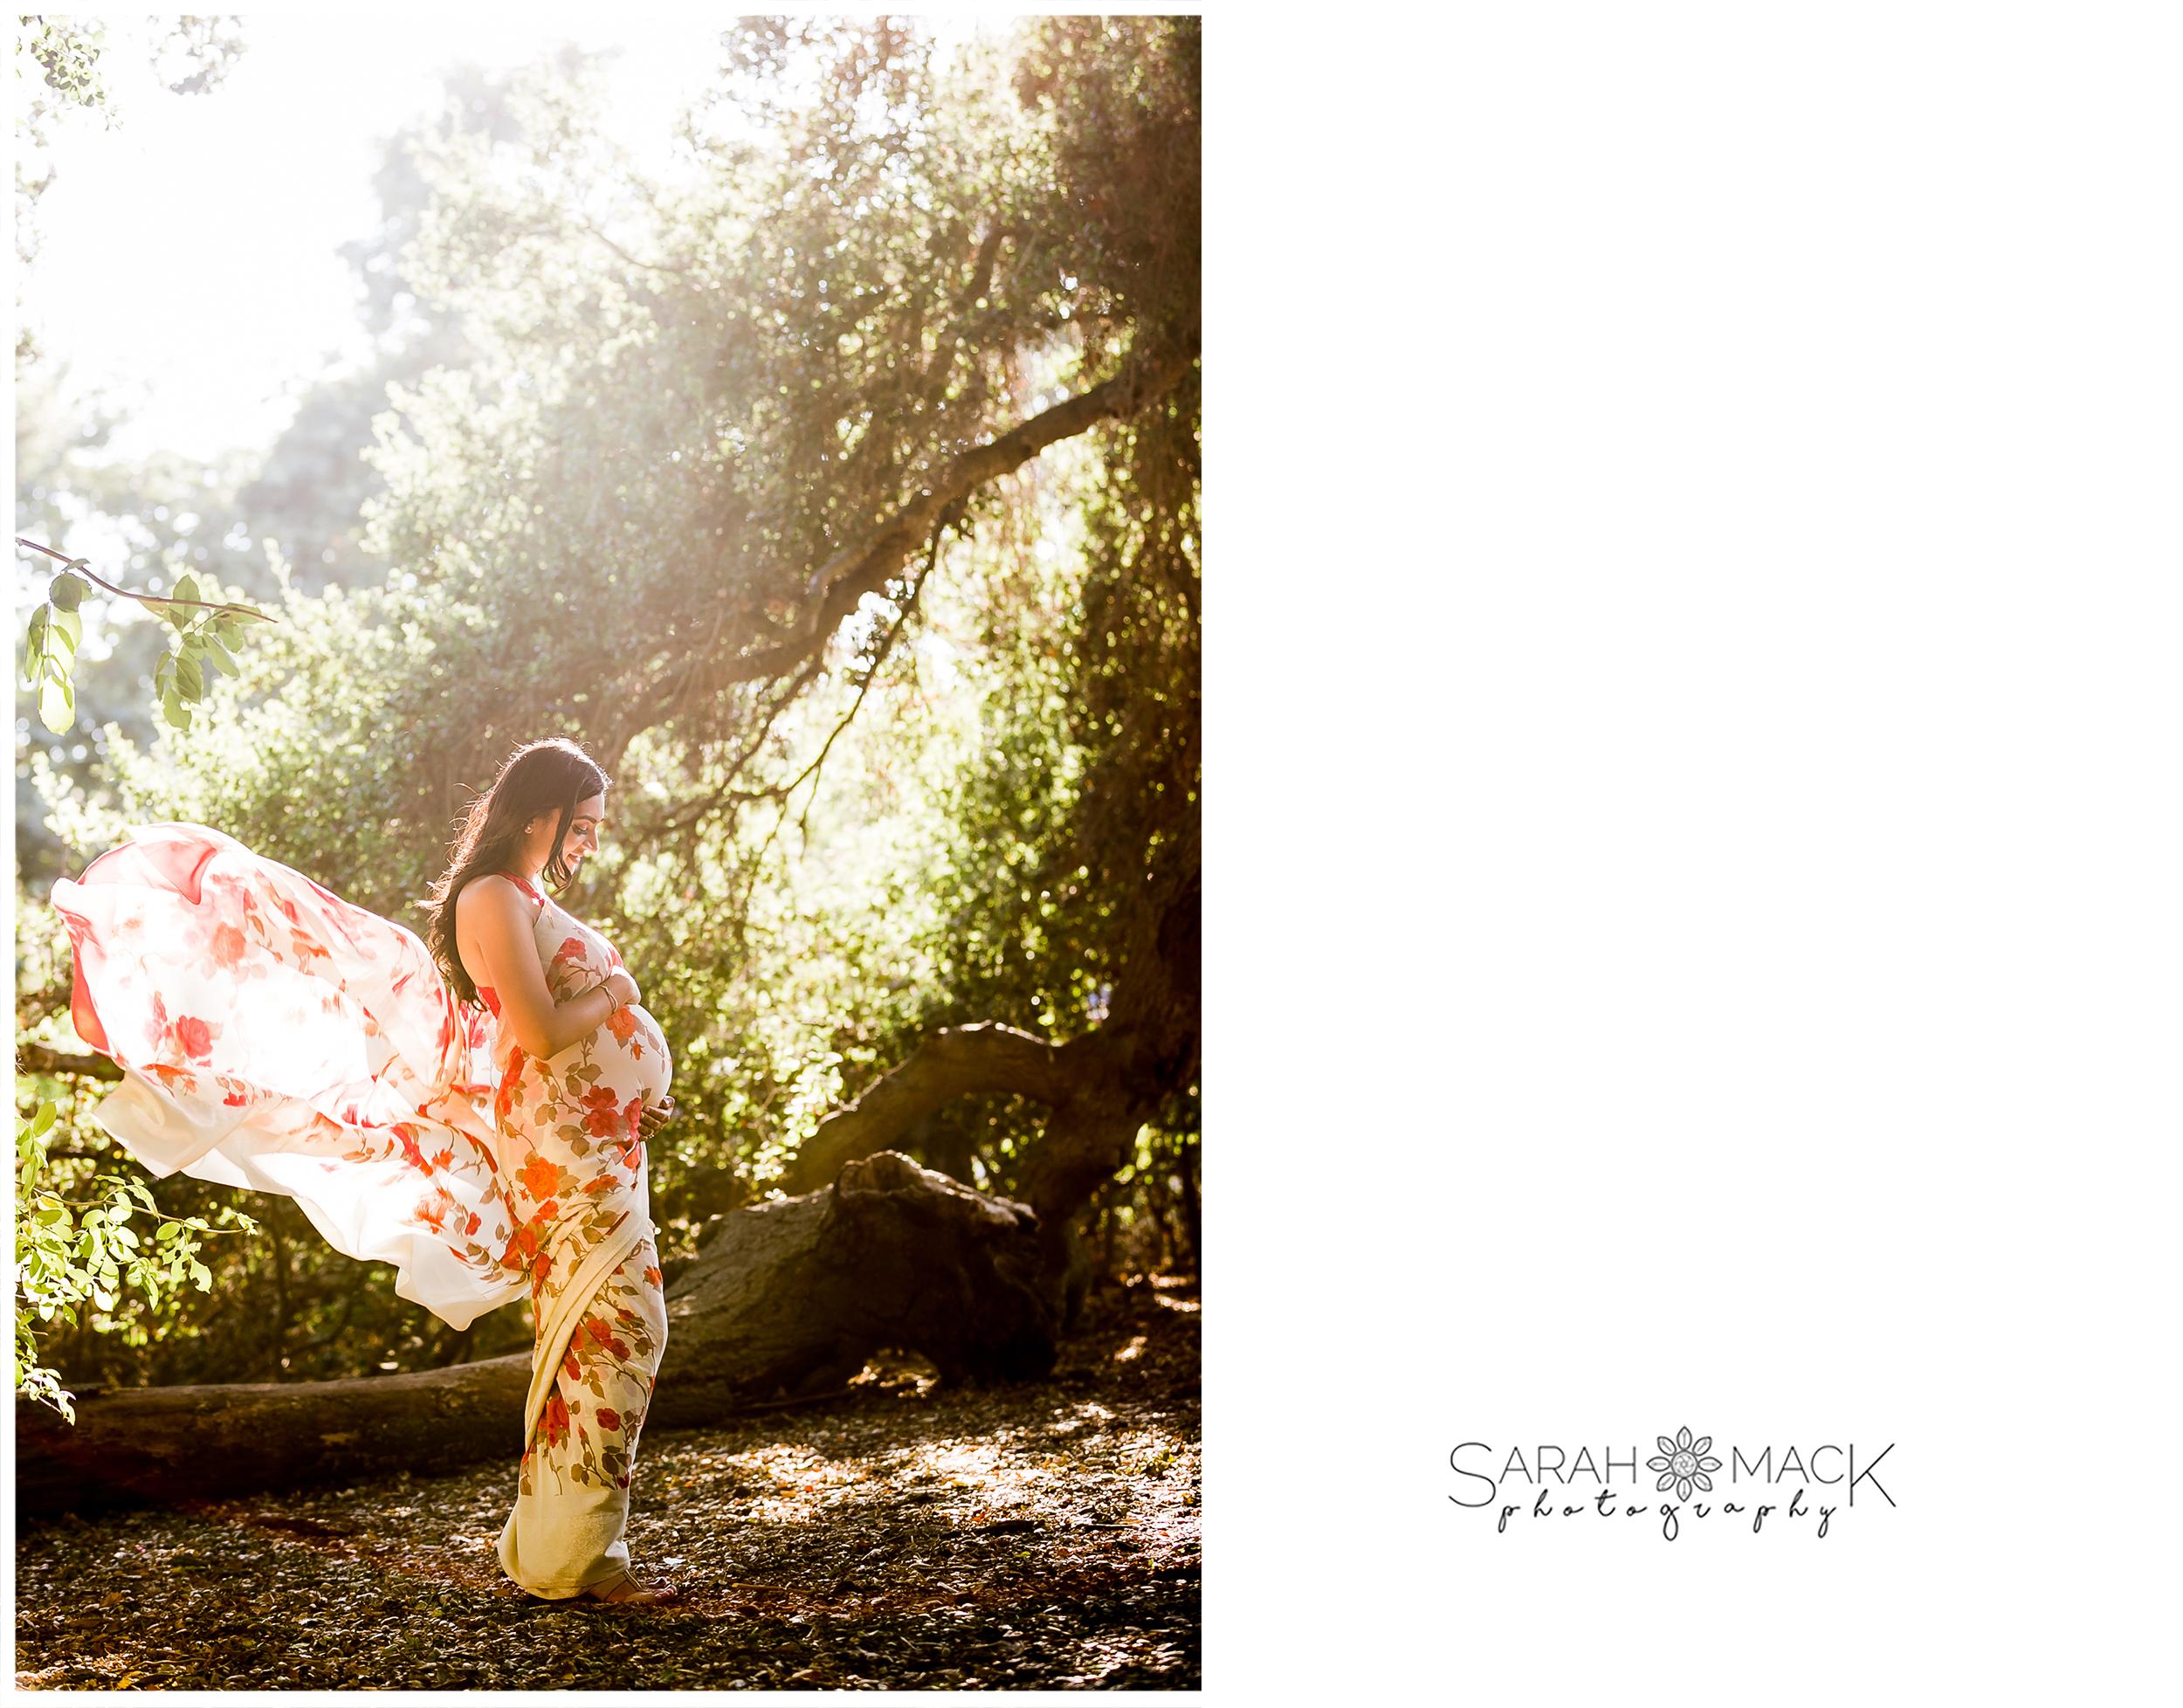 SA-Orange-County-Maternity-Photography-2.jpg